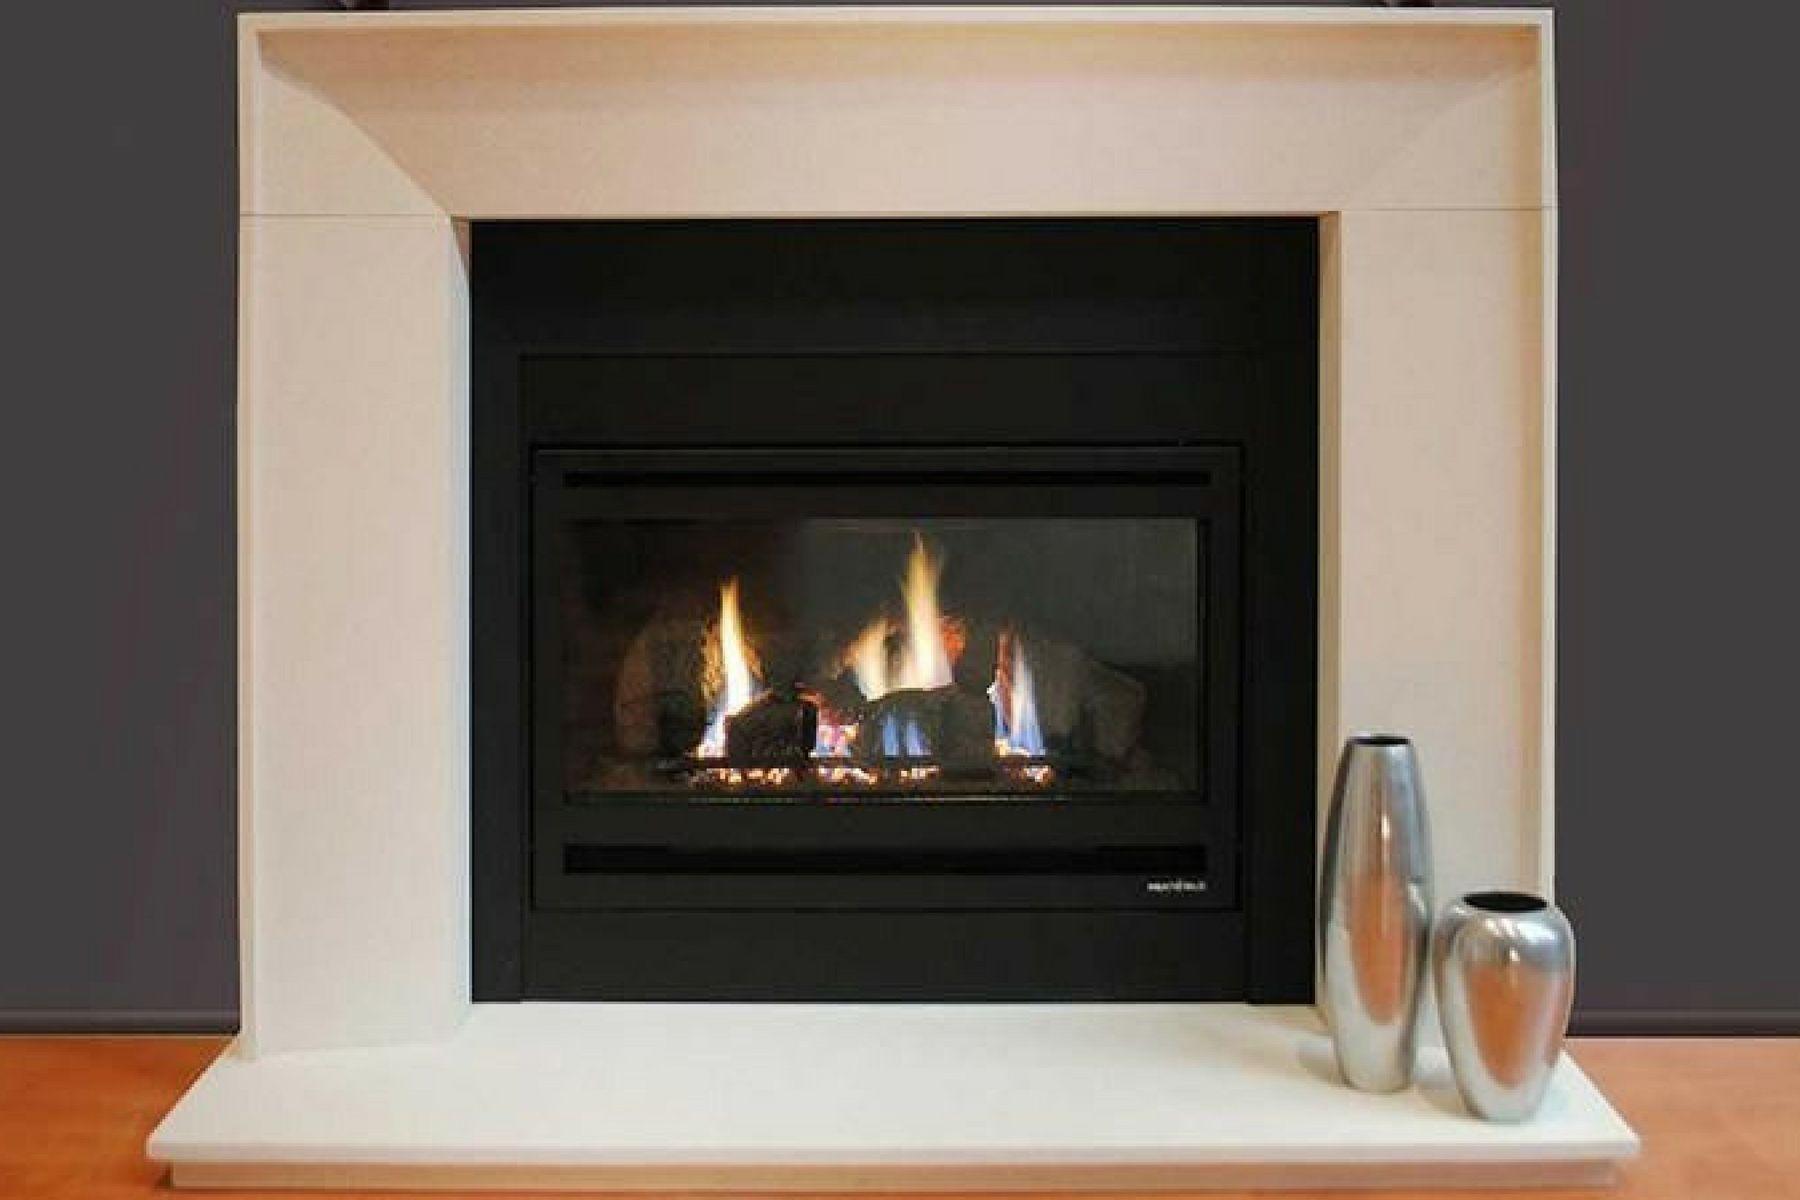 Jetmaster Heat & Glo Supreme I30 Gas Log Fireplace | Gas ...